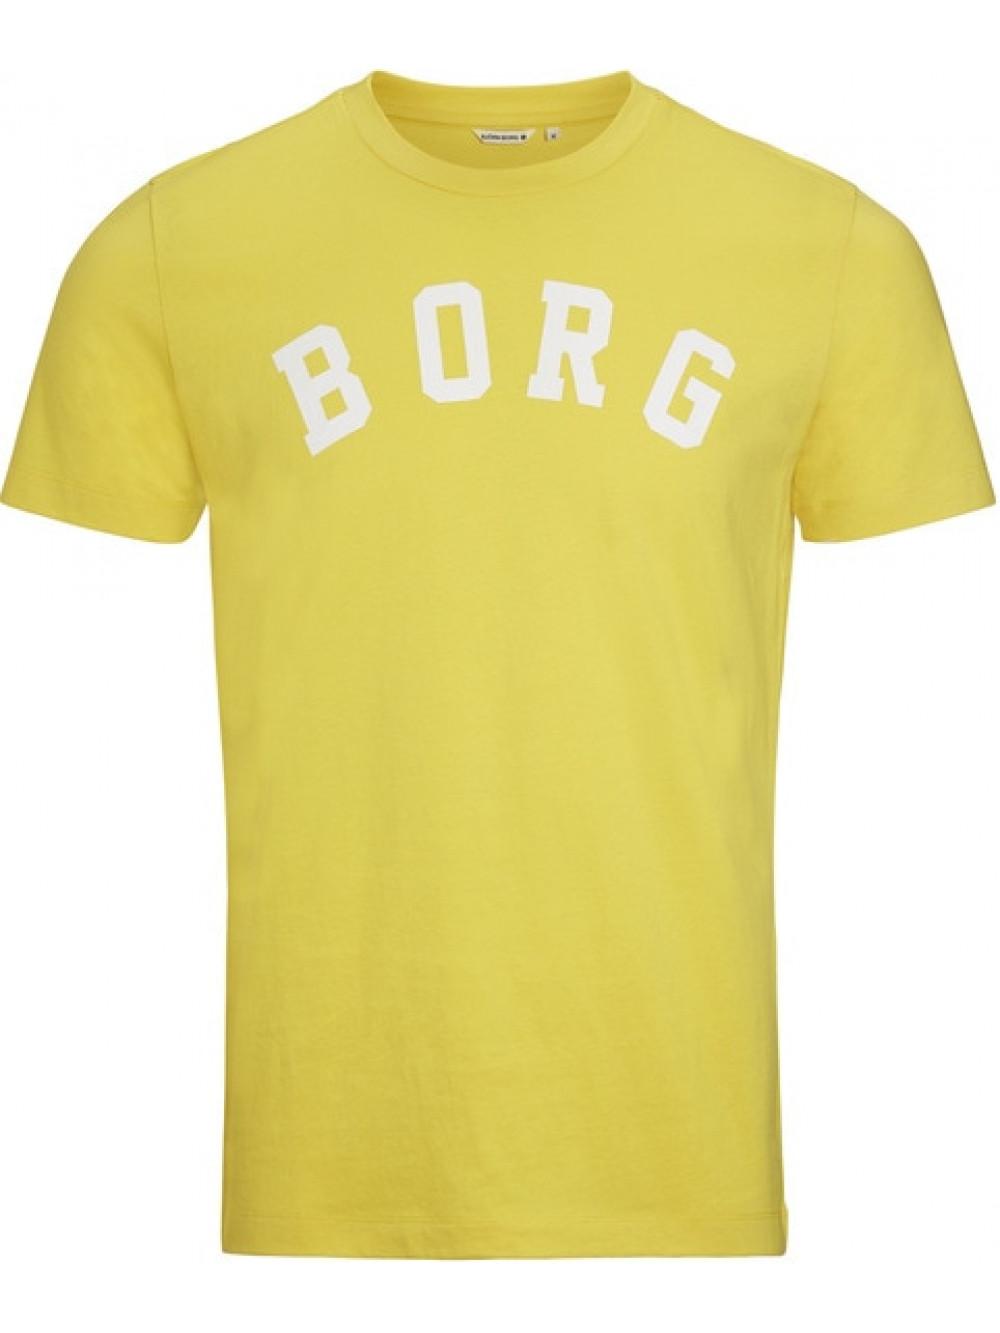 Pánske tričko Björn Borg Berny Tee Maize Yellow žlté